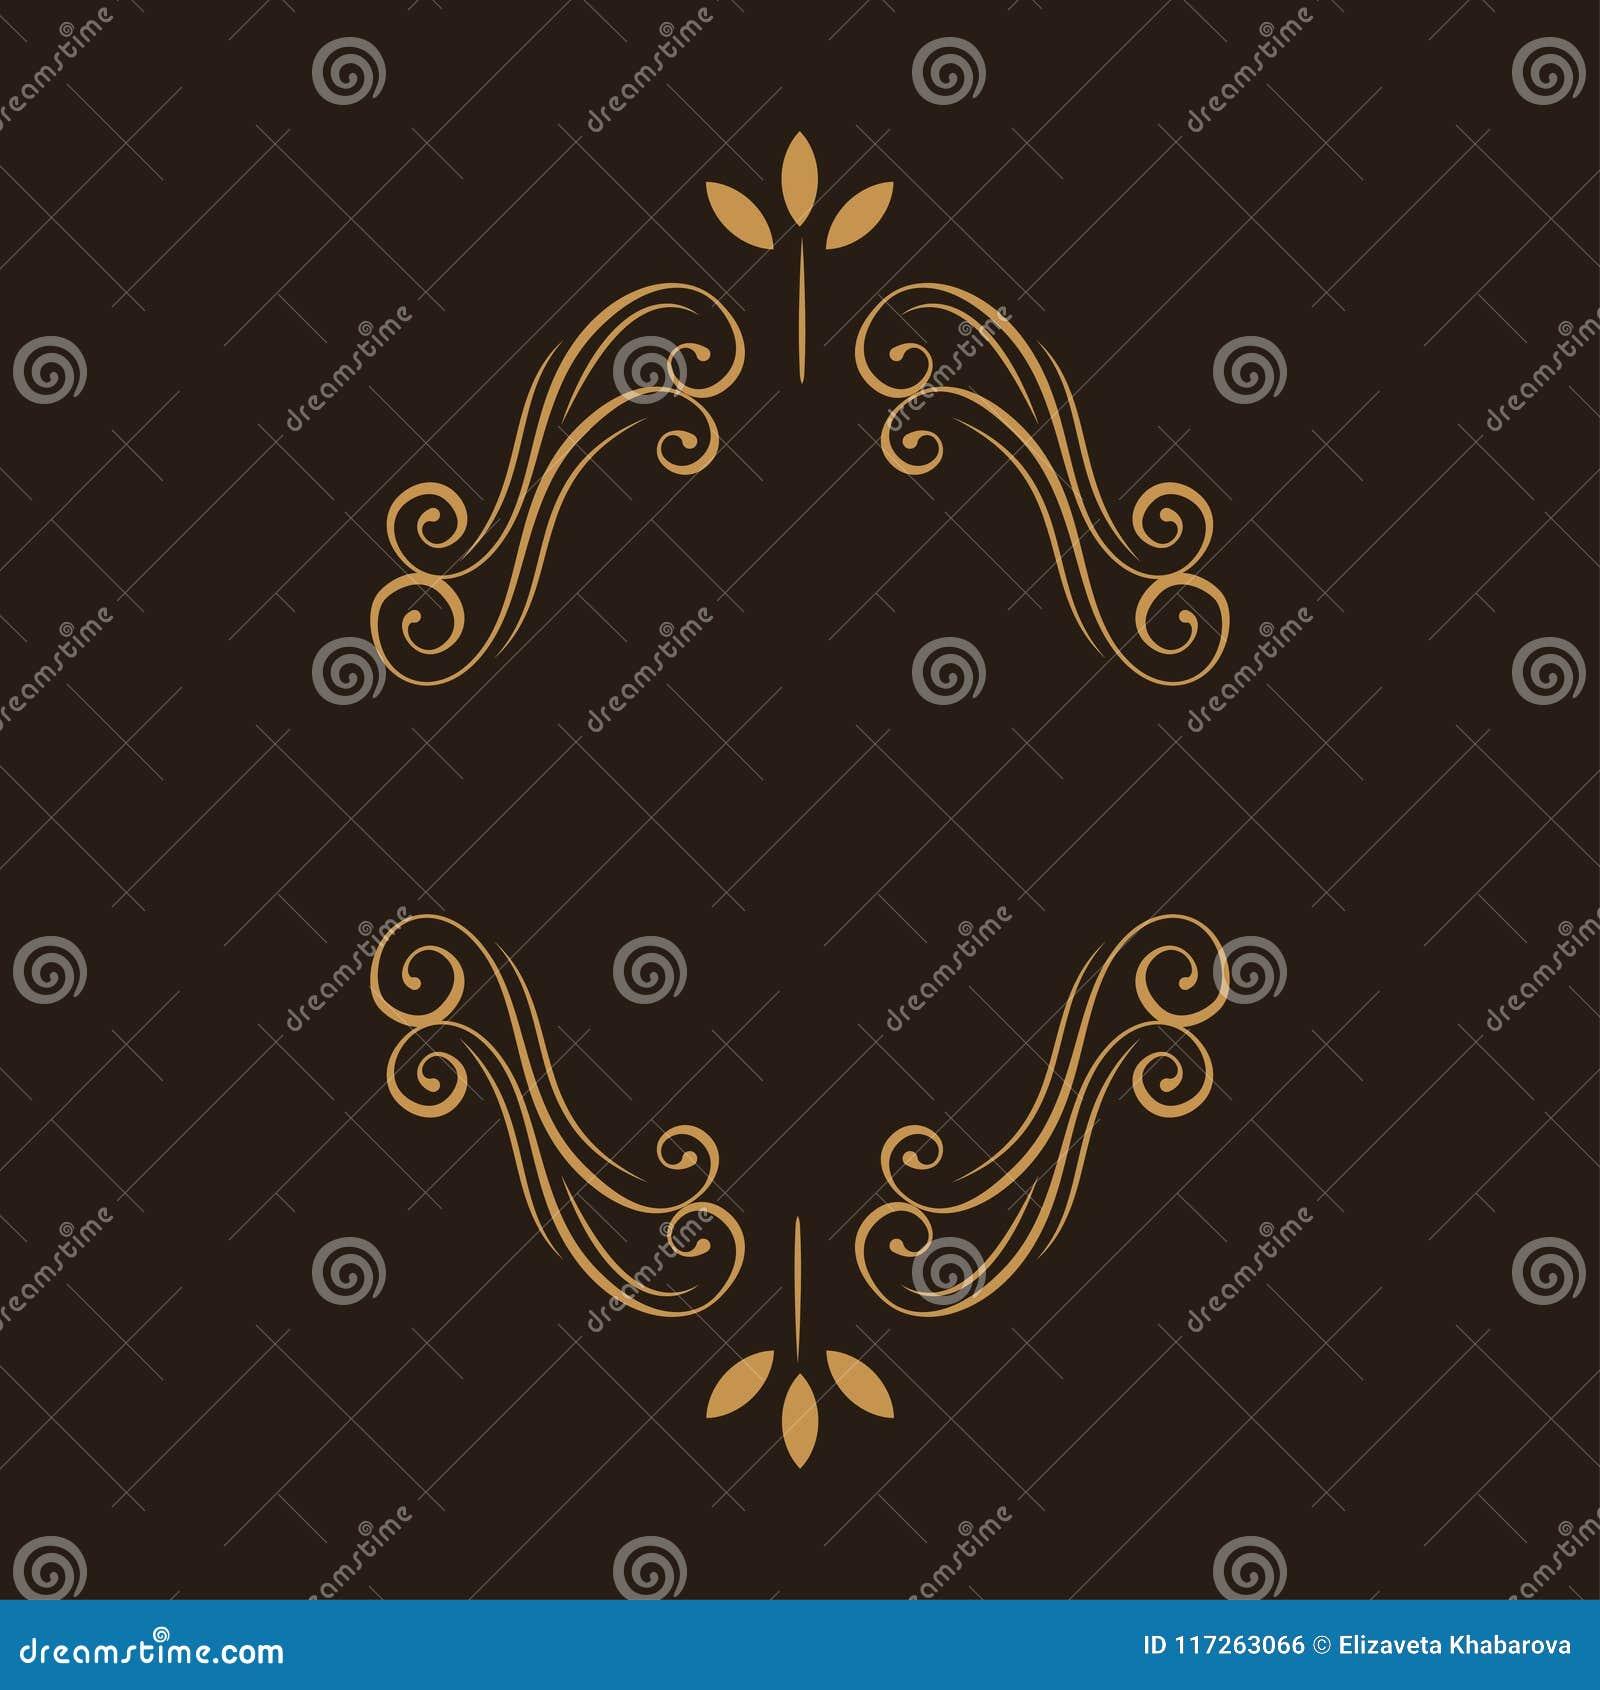 Ornamental floral frame. Page decoration. Swirls, flourish scroll design element. Wedding invitation, Greeting card. Vector.